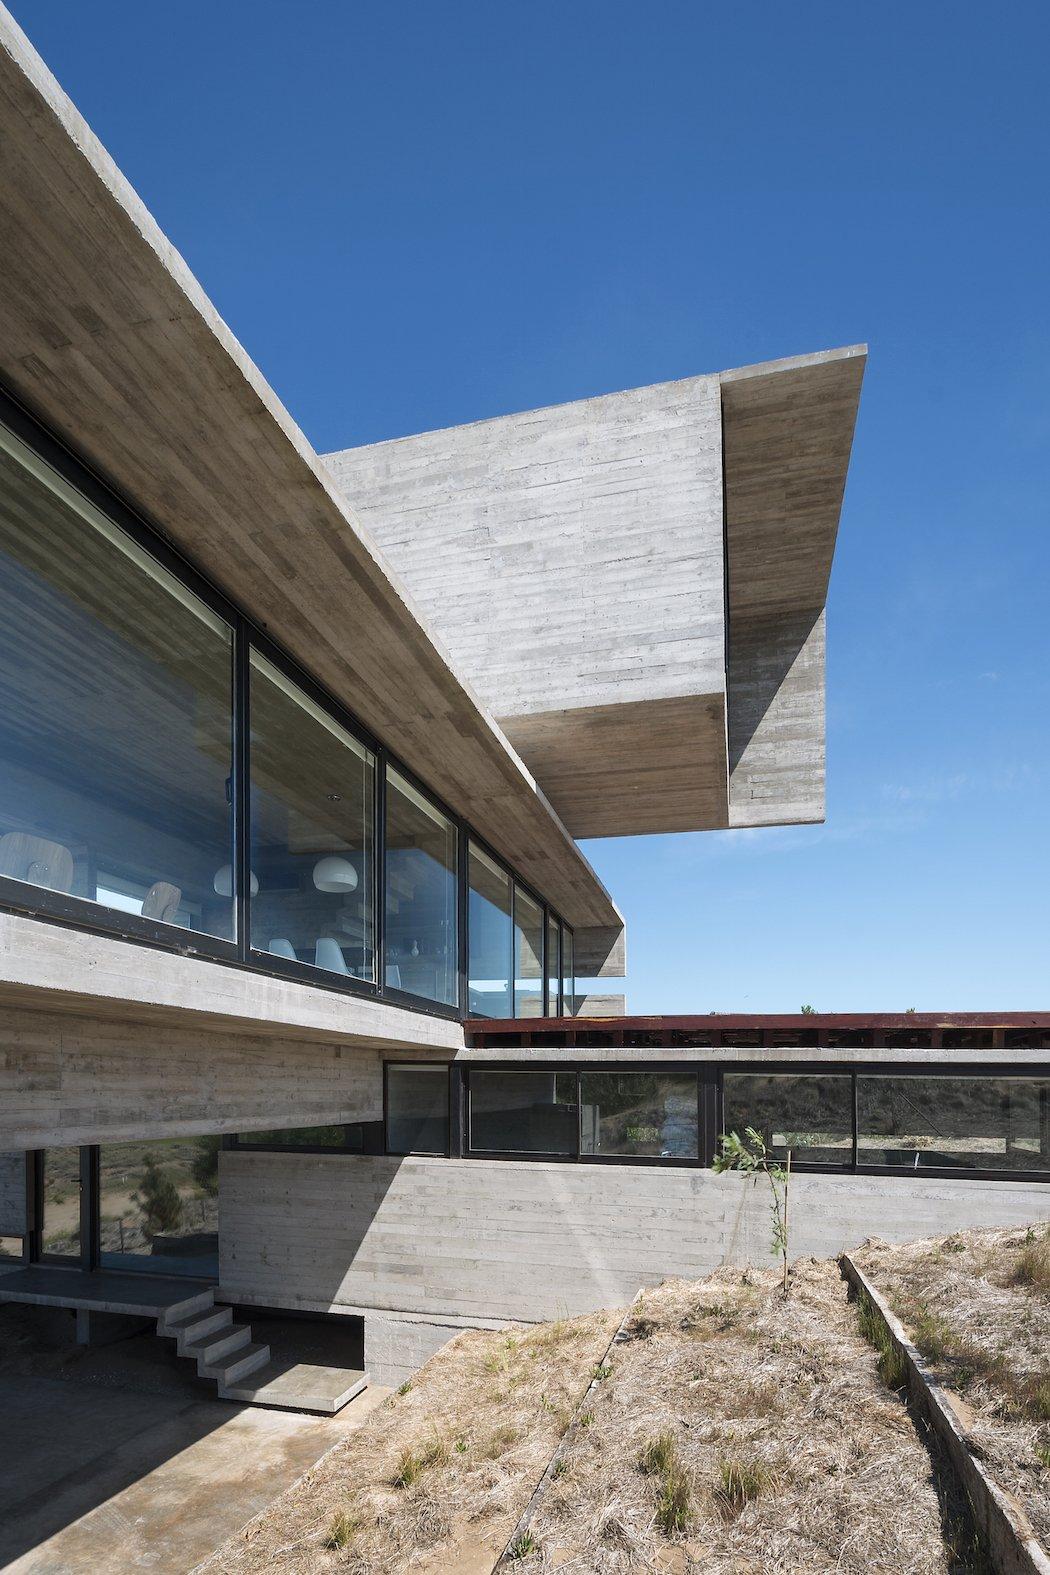 Architecture_GasaGolf_LucianoKruk_08